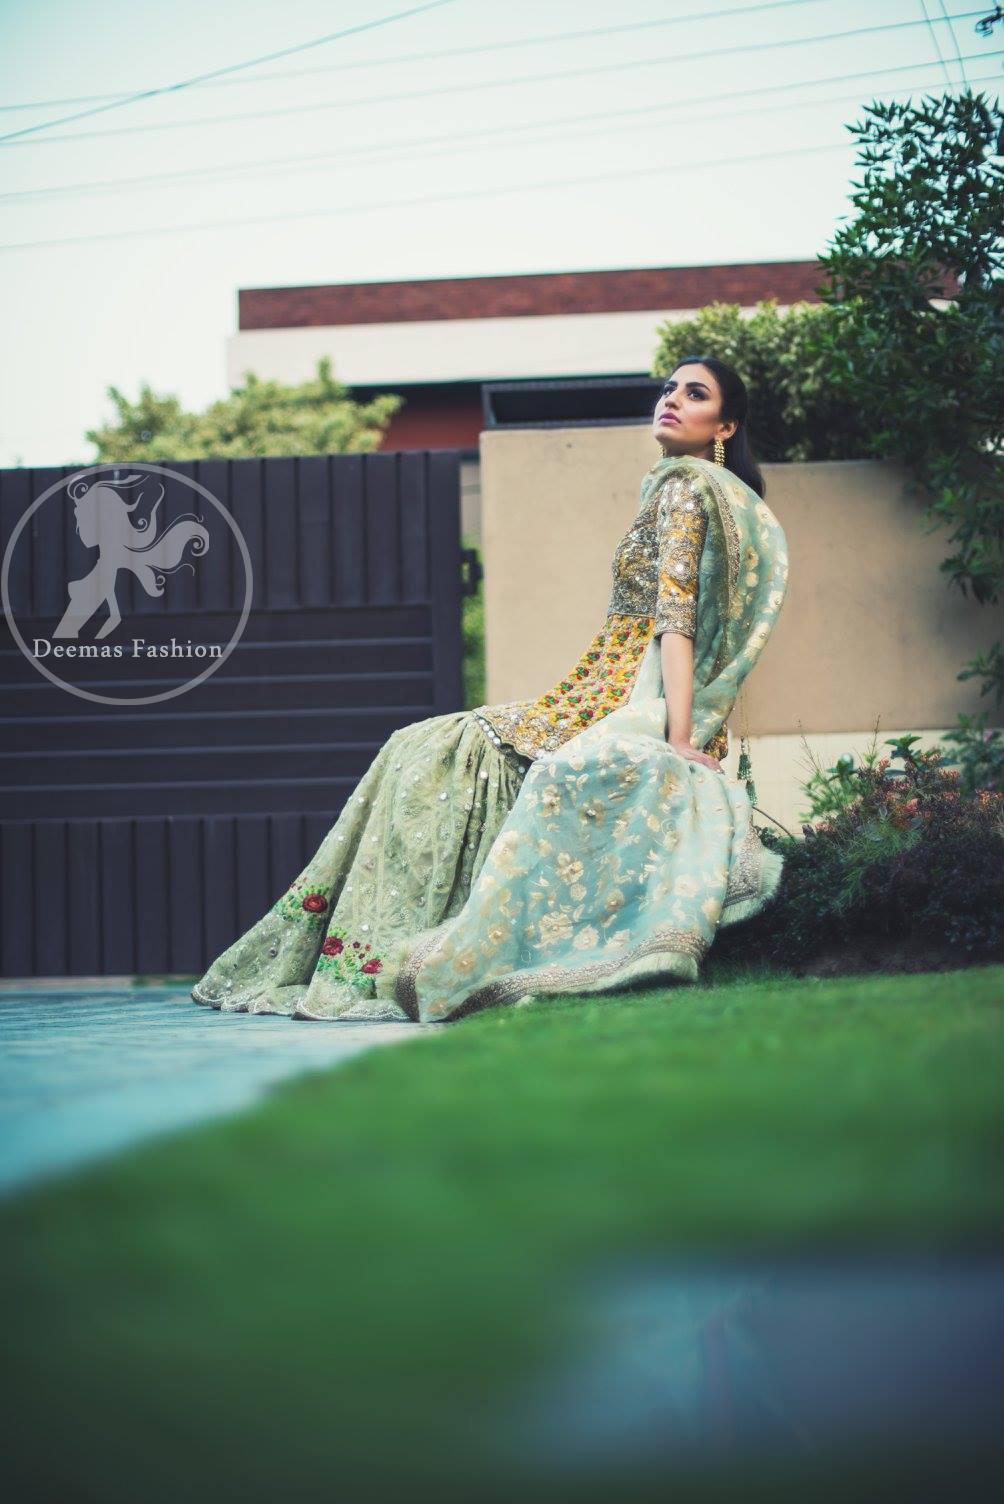 mehndi-dress-2016-yellow-short-frock-with-light-green-gharara-4